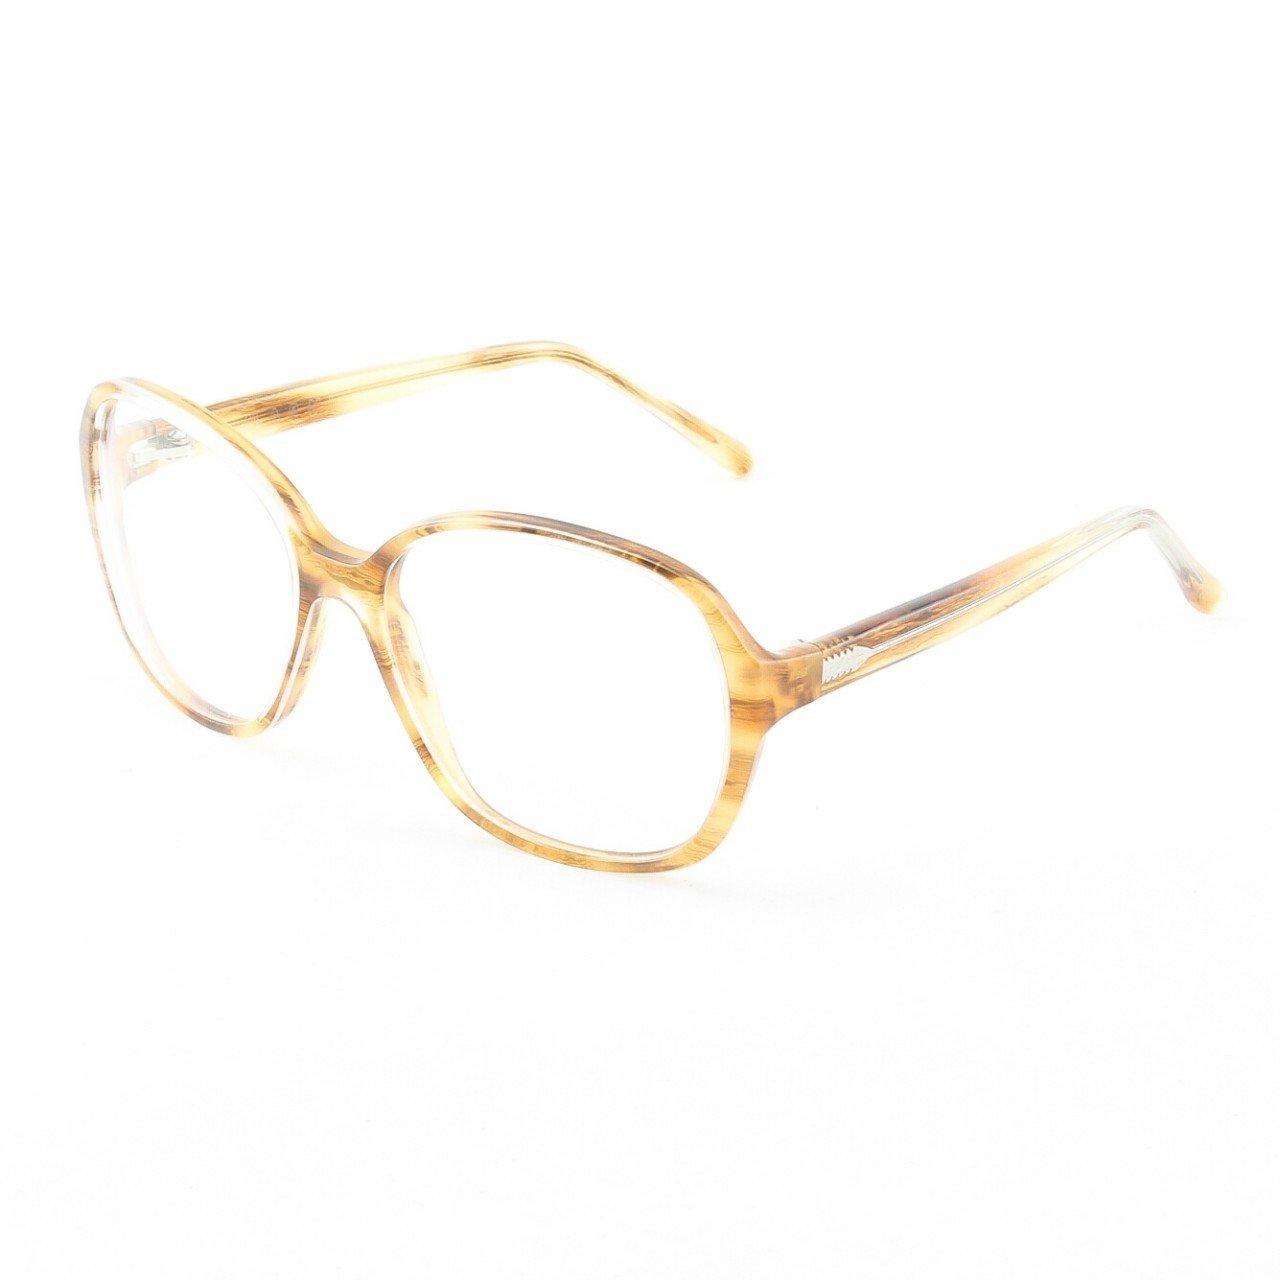 Marni MA700 Eyeglasses Col. 04 Classic Tortoise with Clear Lenses